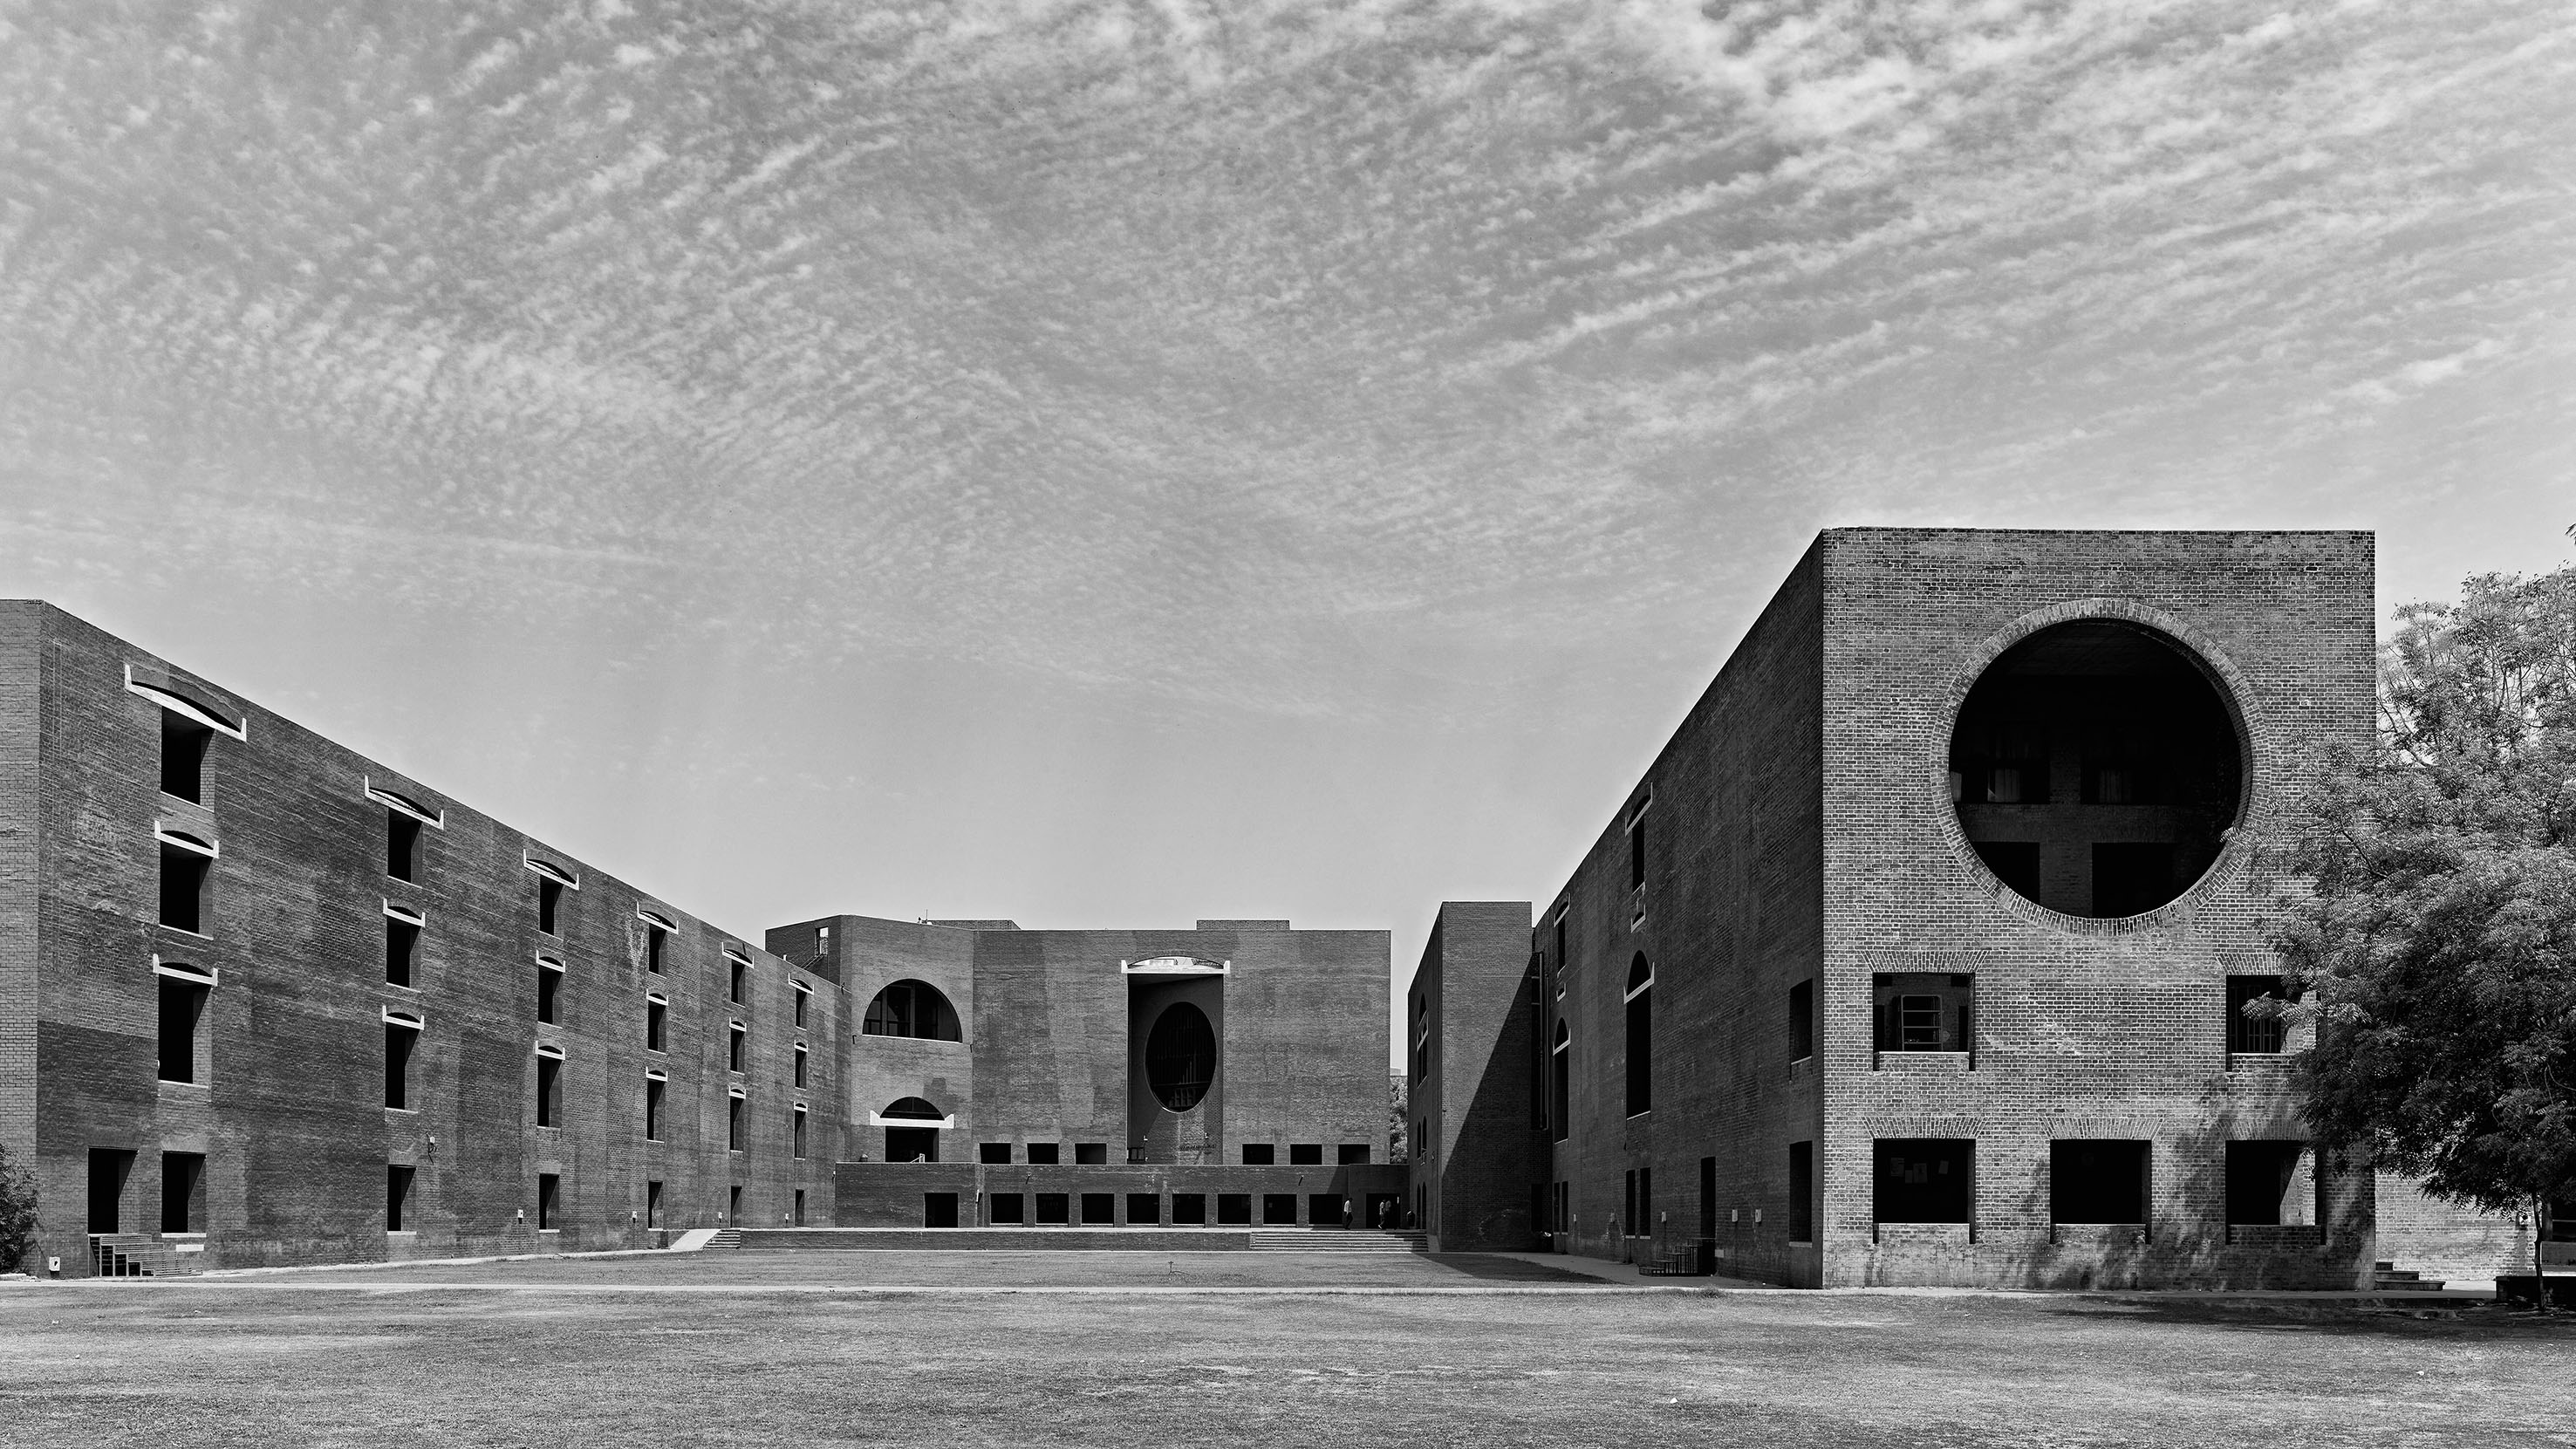 Hindistan İşletme Entstitüsü, Ahmedabad, Hindistan, 1962-74